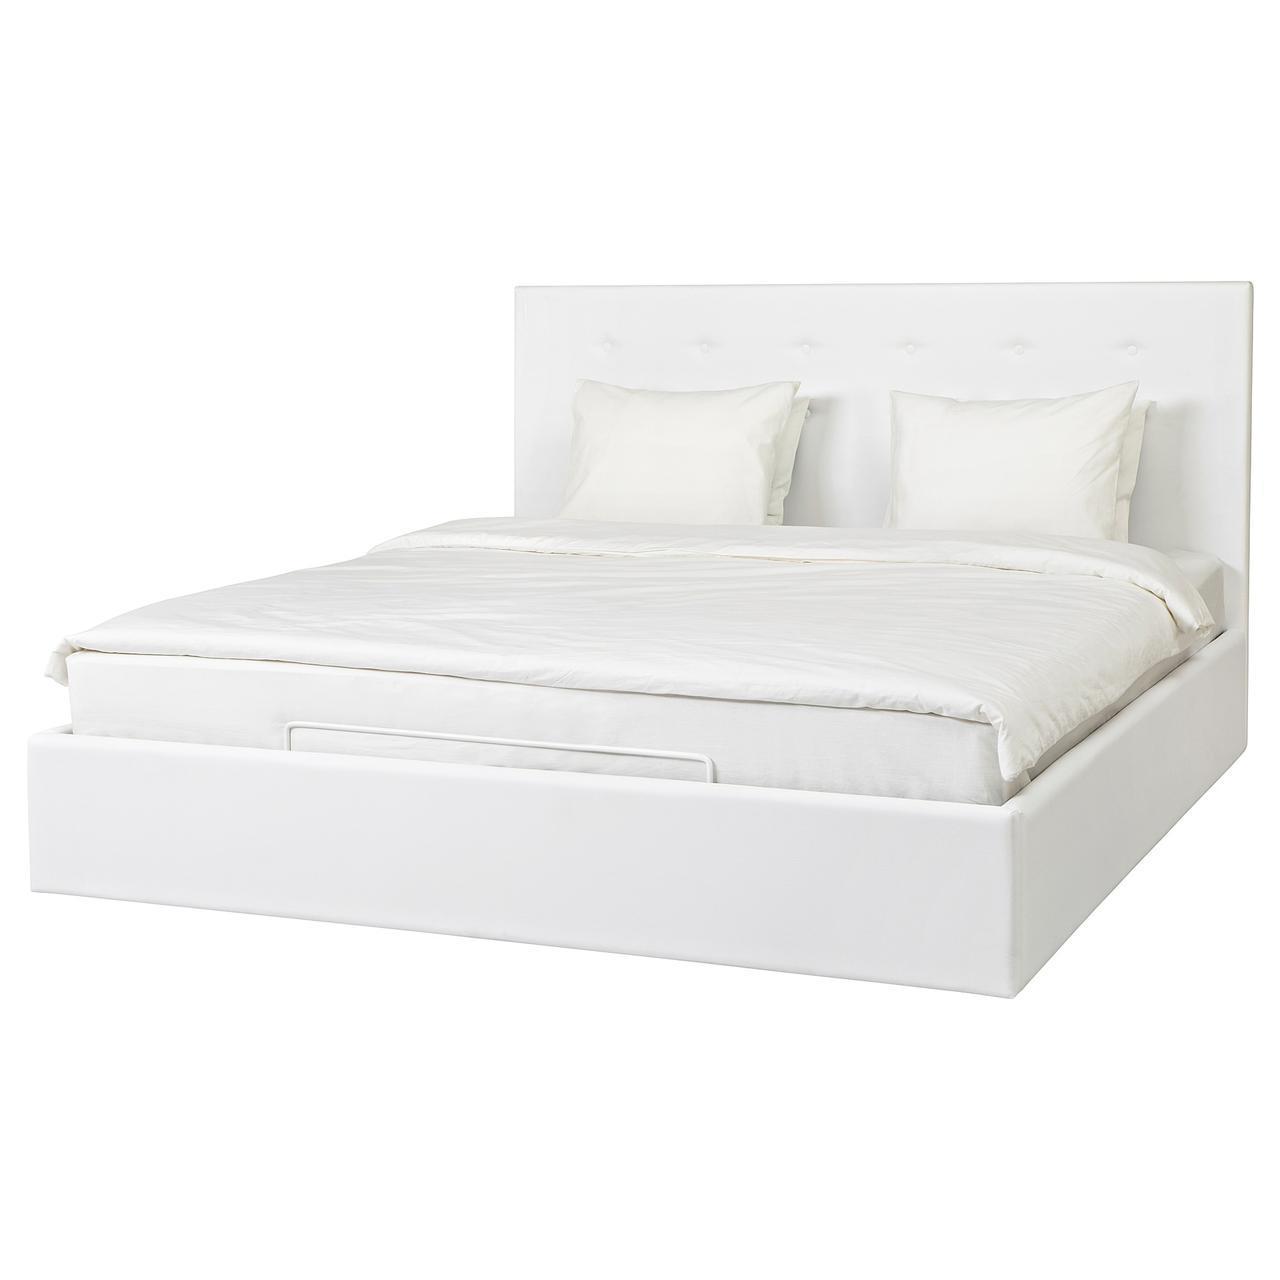 IKEA GVARV (804.097.16) Кровать с подъемным механизмом, Idhult white